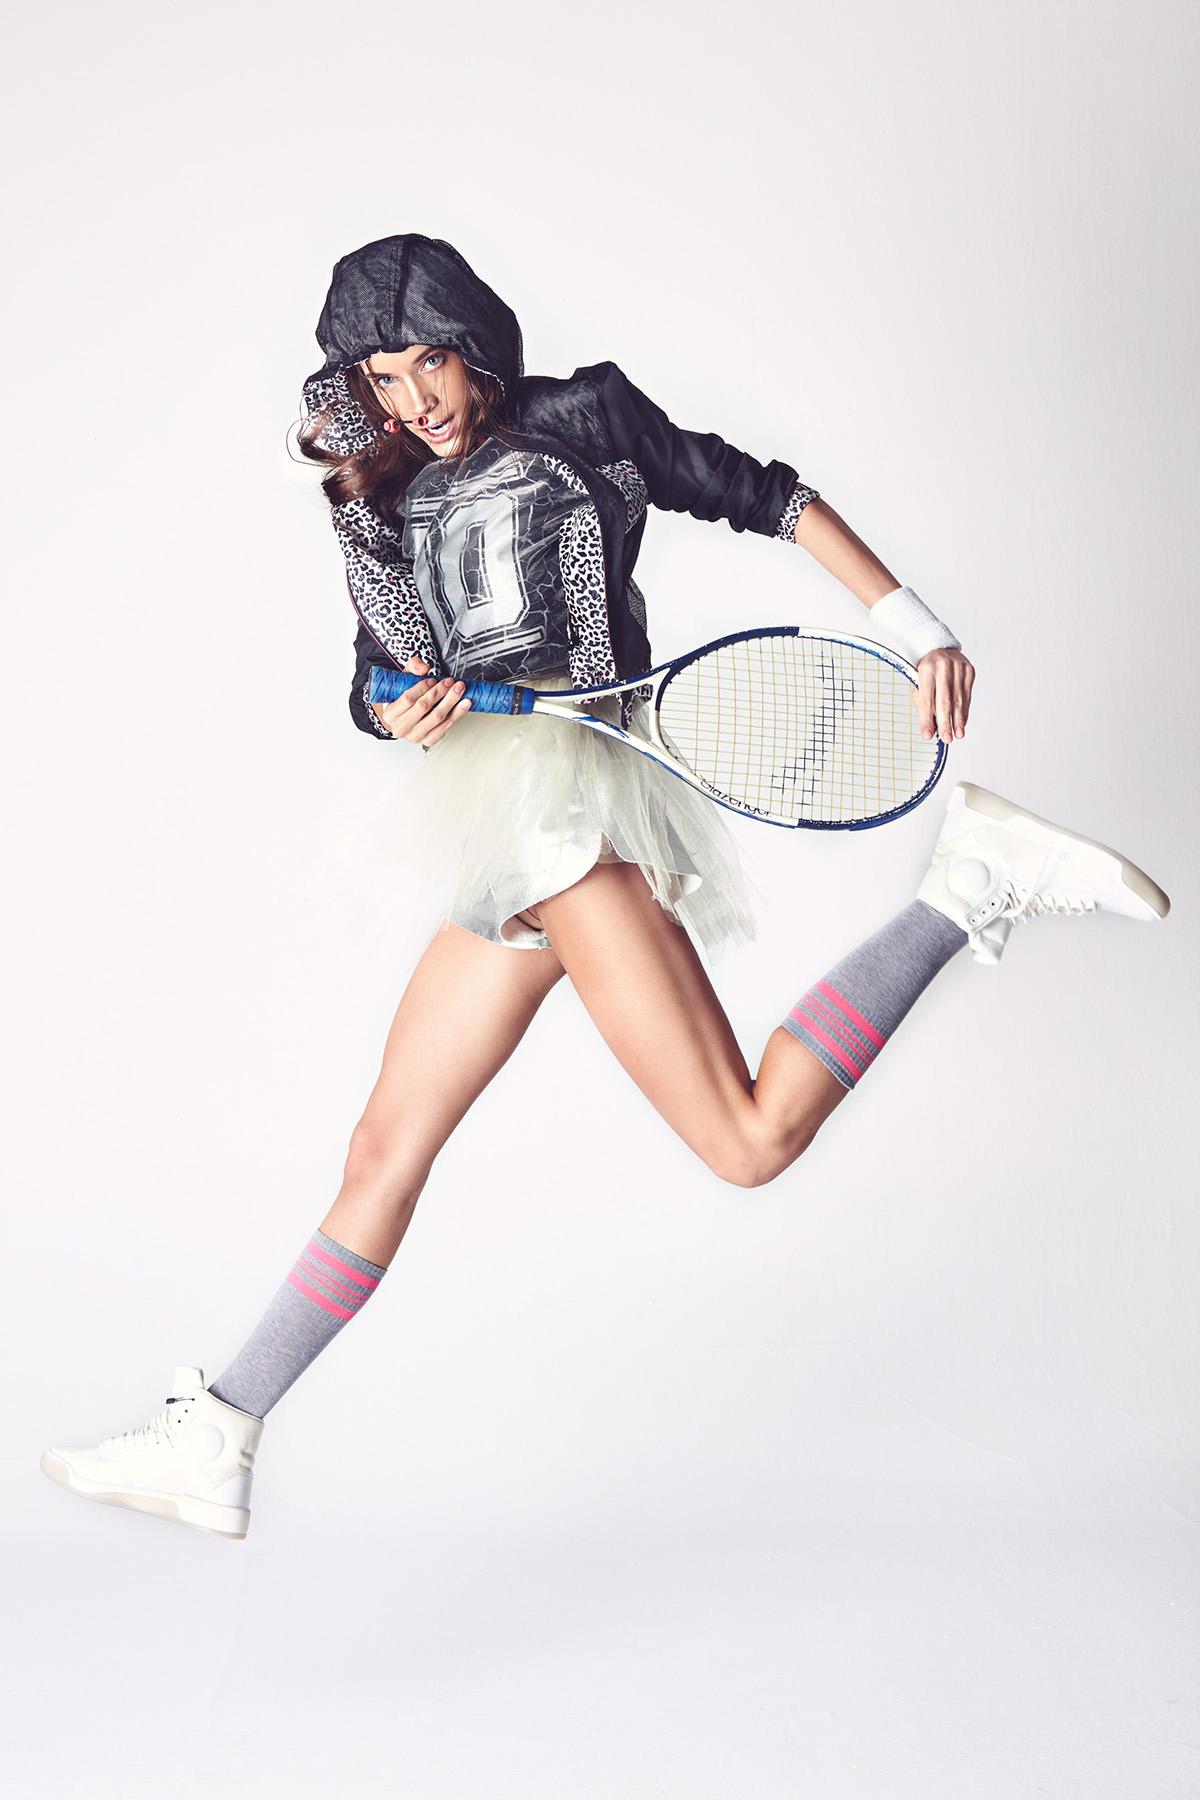 Studio Sports Fashion Shoot on Behance